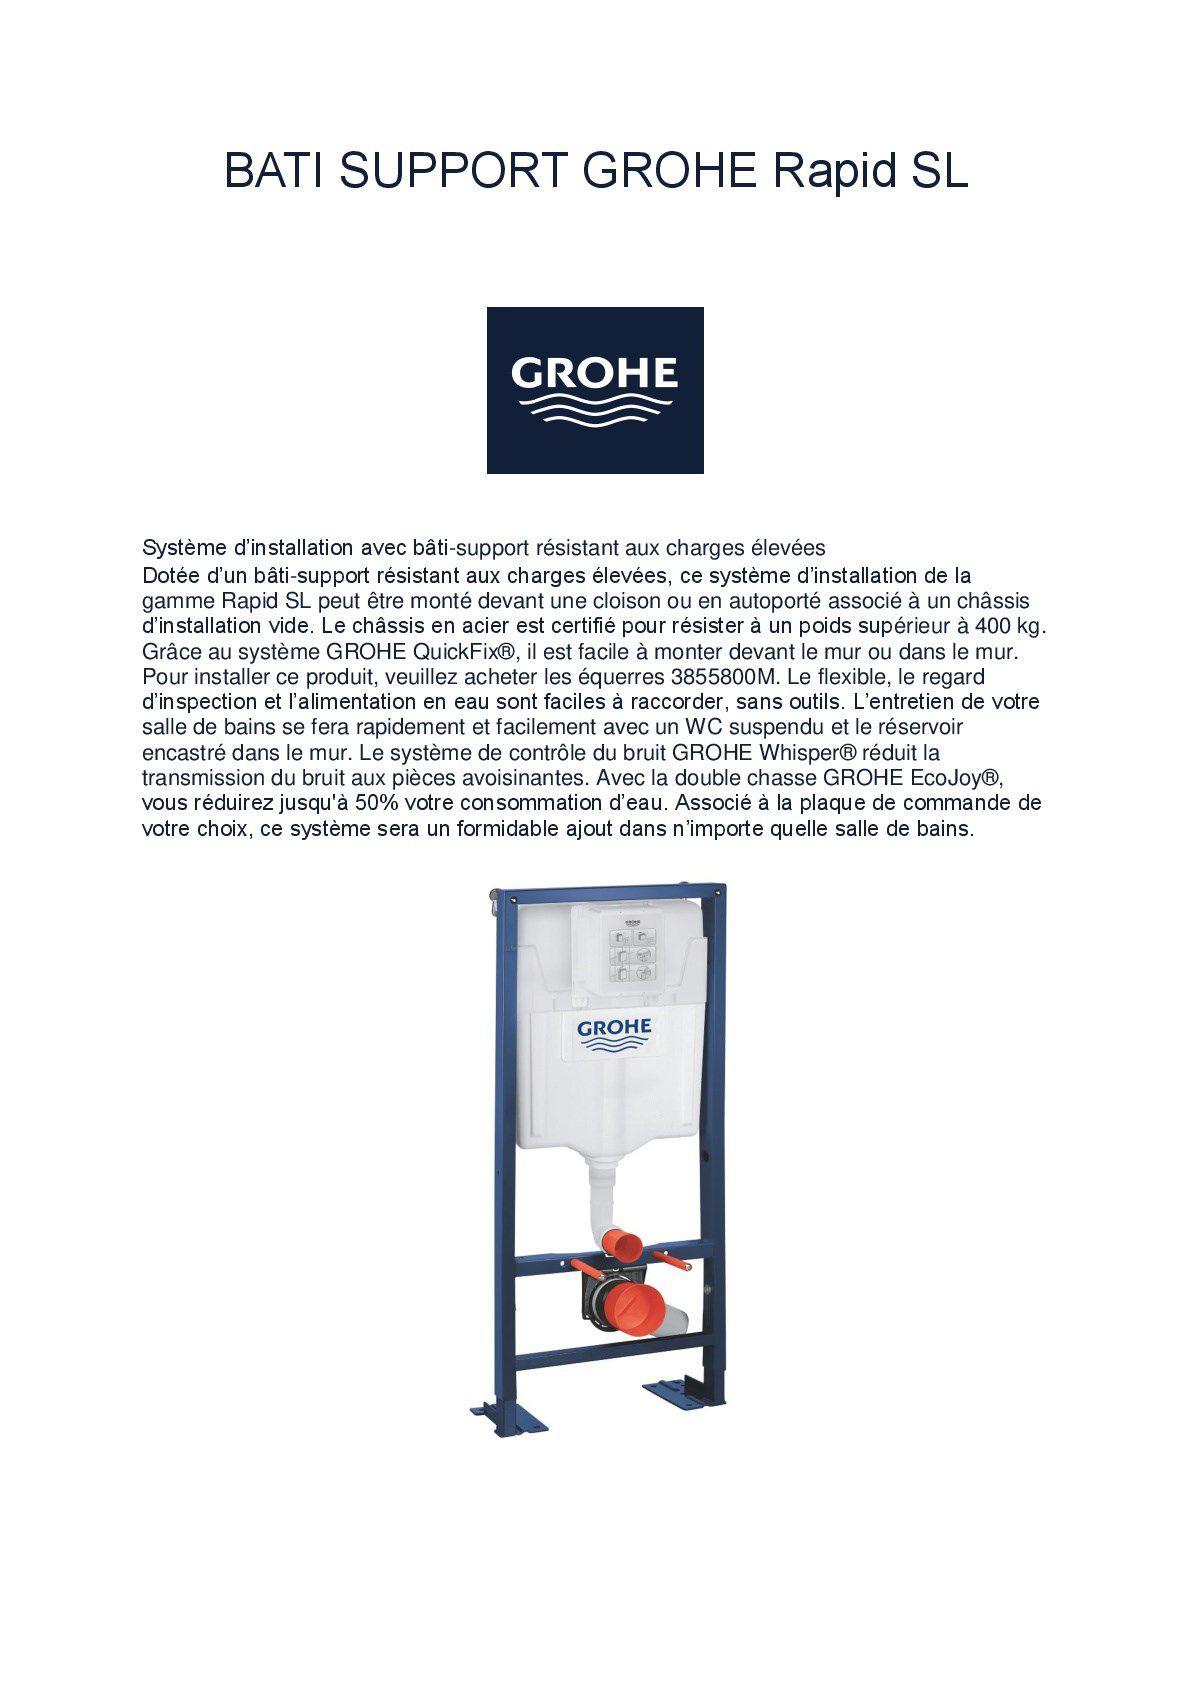 Wc Suspendu 4 Pieds pack complet wc suspendu grohe bâti-support 113 cm + plaque